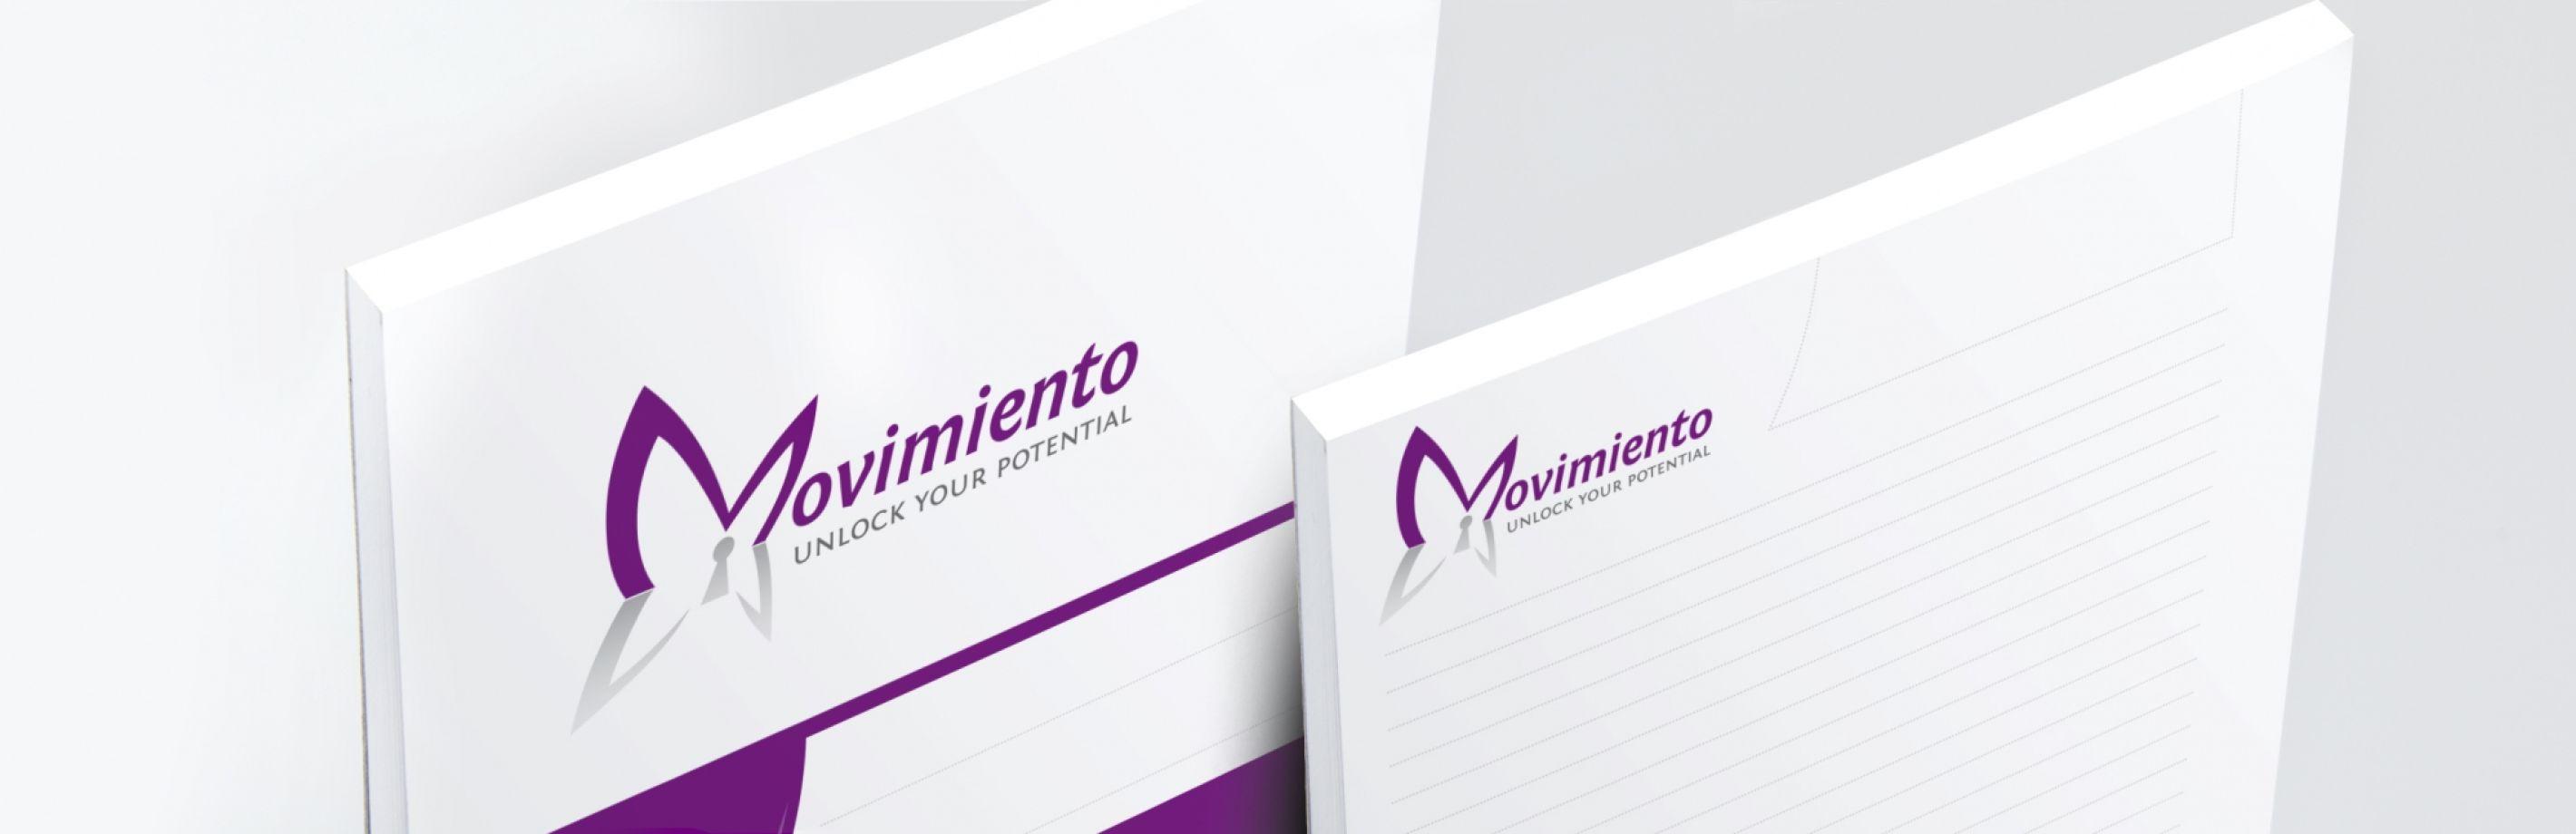 Movimiento Notablok A4